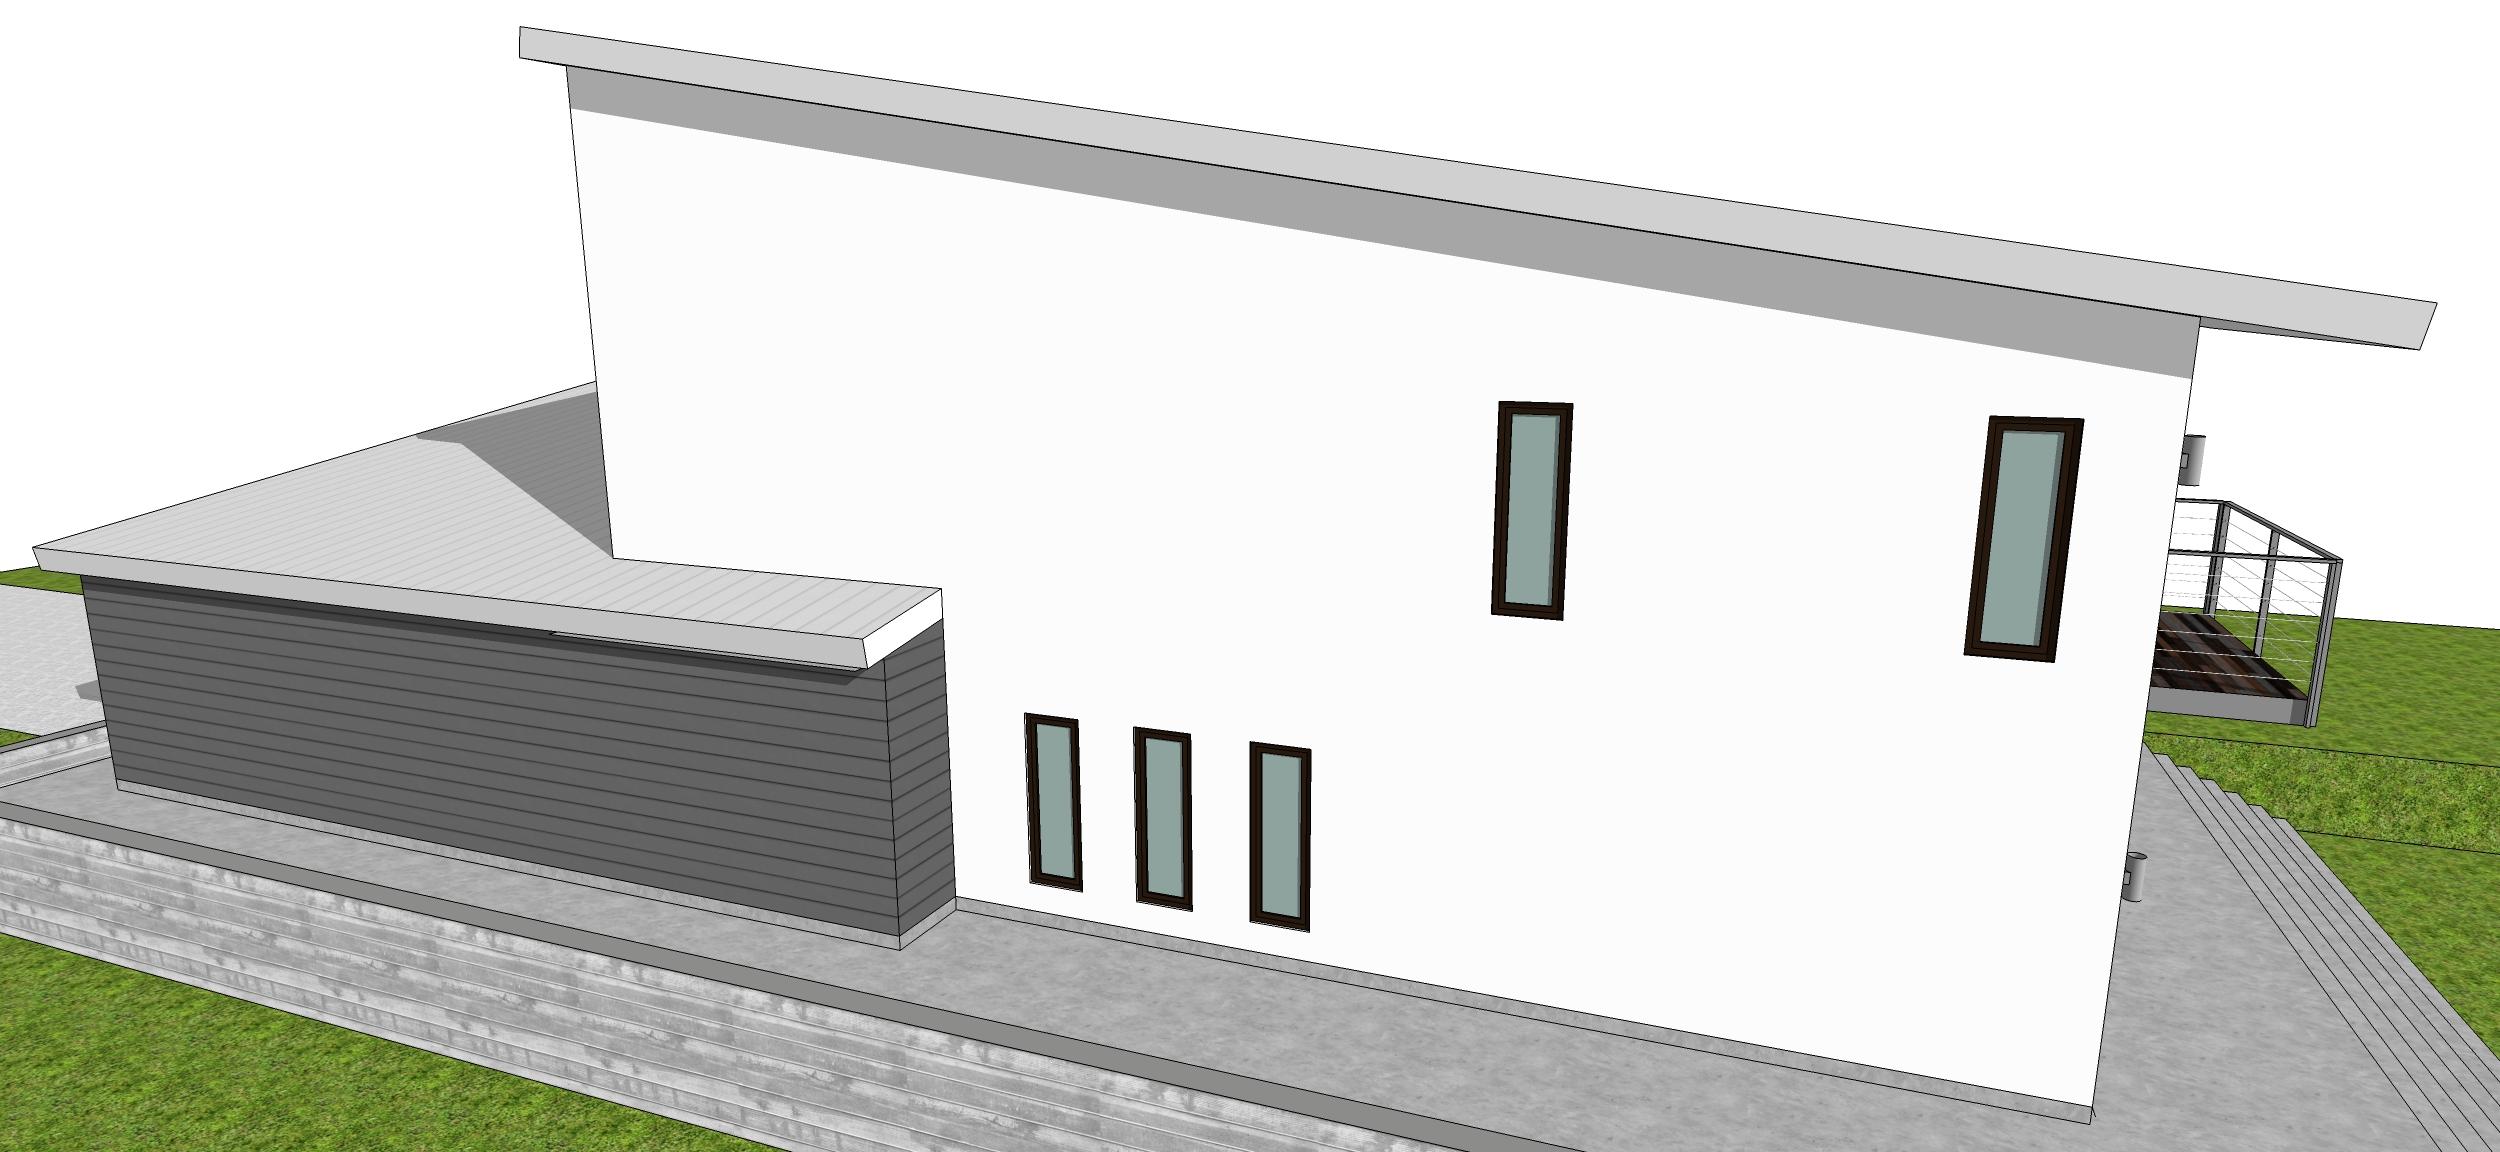 House 2 - SouthWest View.jpg